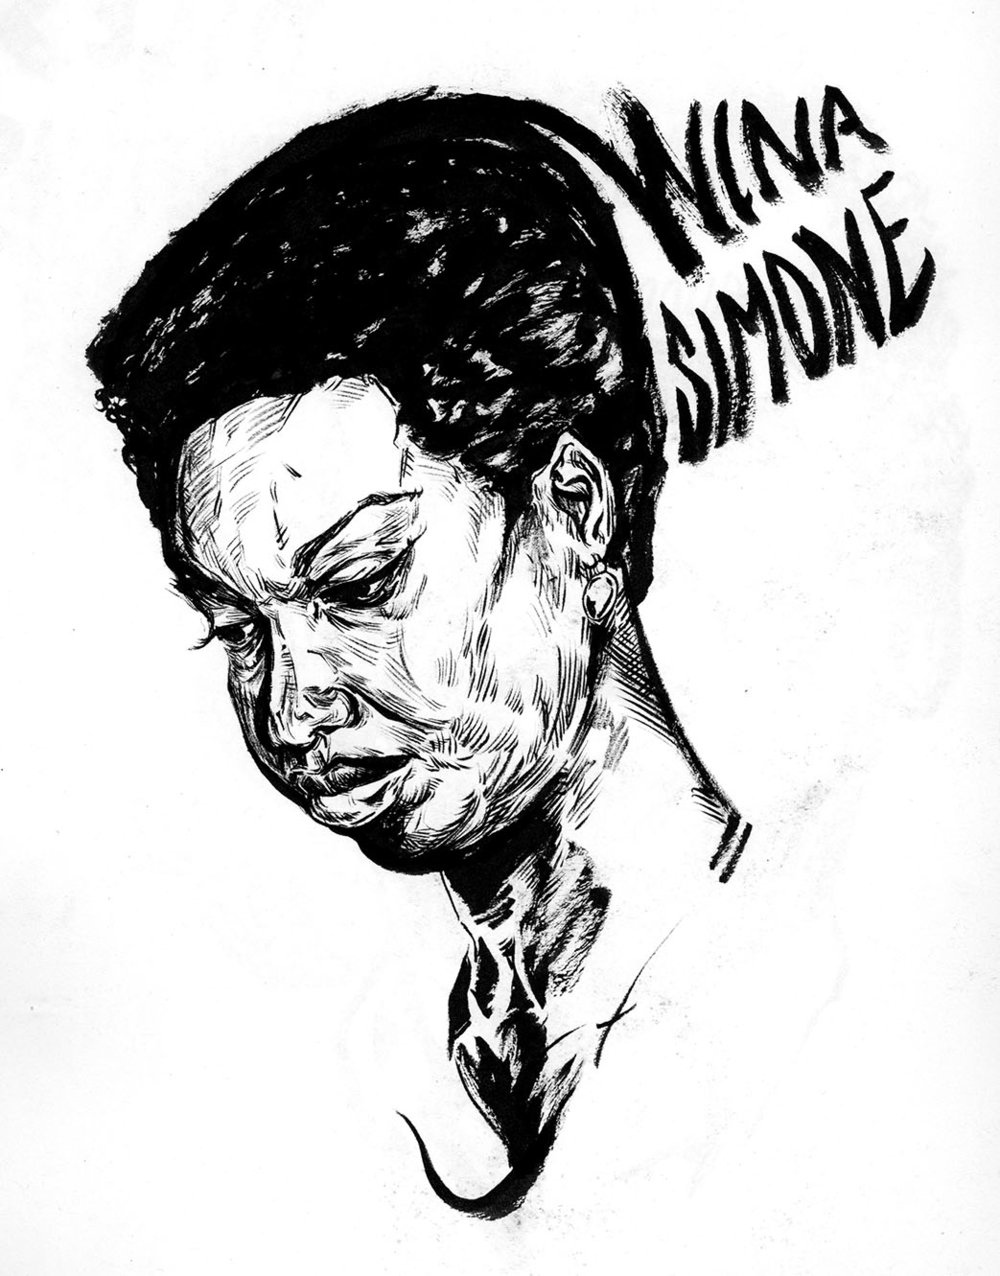 Nina_Simone_sketch.jpg